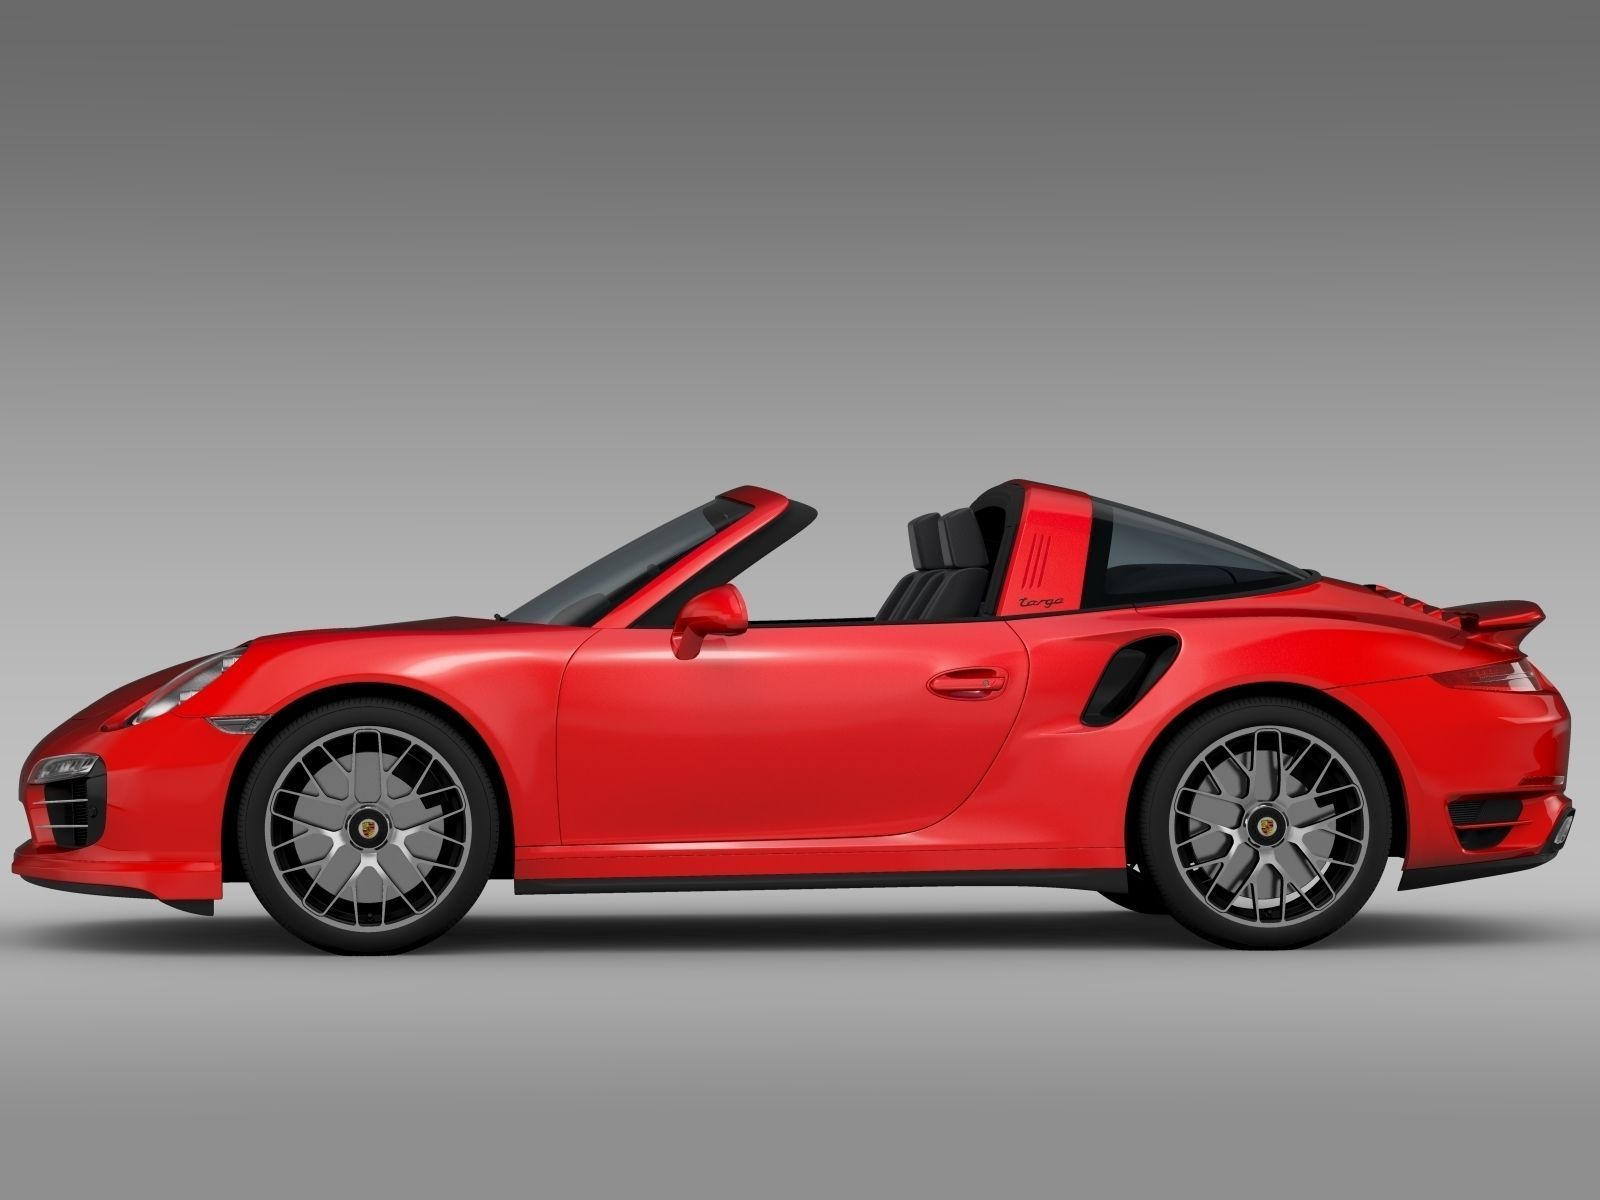 porsche 911 turbo s targa 991 2015 3d model max obj 3ds fbx c4d lwo lw lws. Black Bedroom Furniture Sets. Home Design Ideas